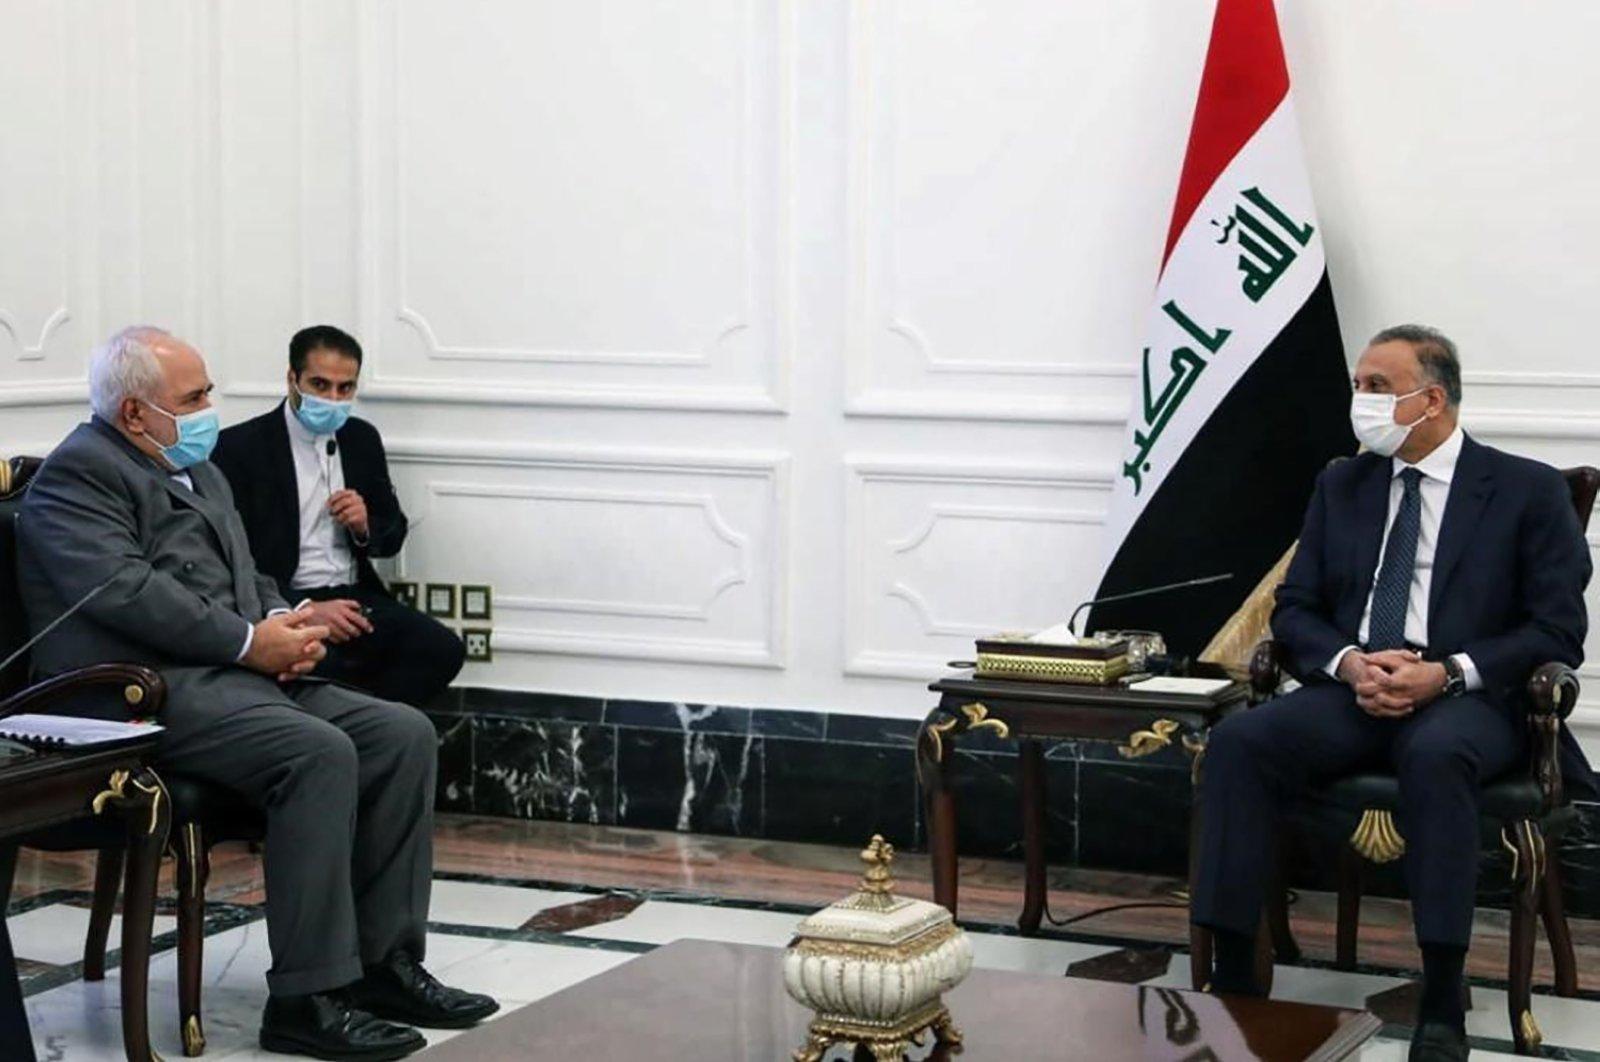 Iraqi Prime Minister Mustafa al-Kadhimi(L) meets with Iran's Foreign Minister Mohammad Javad Zarif, Baghdad, July 19, 2020. (AFP Photo)